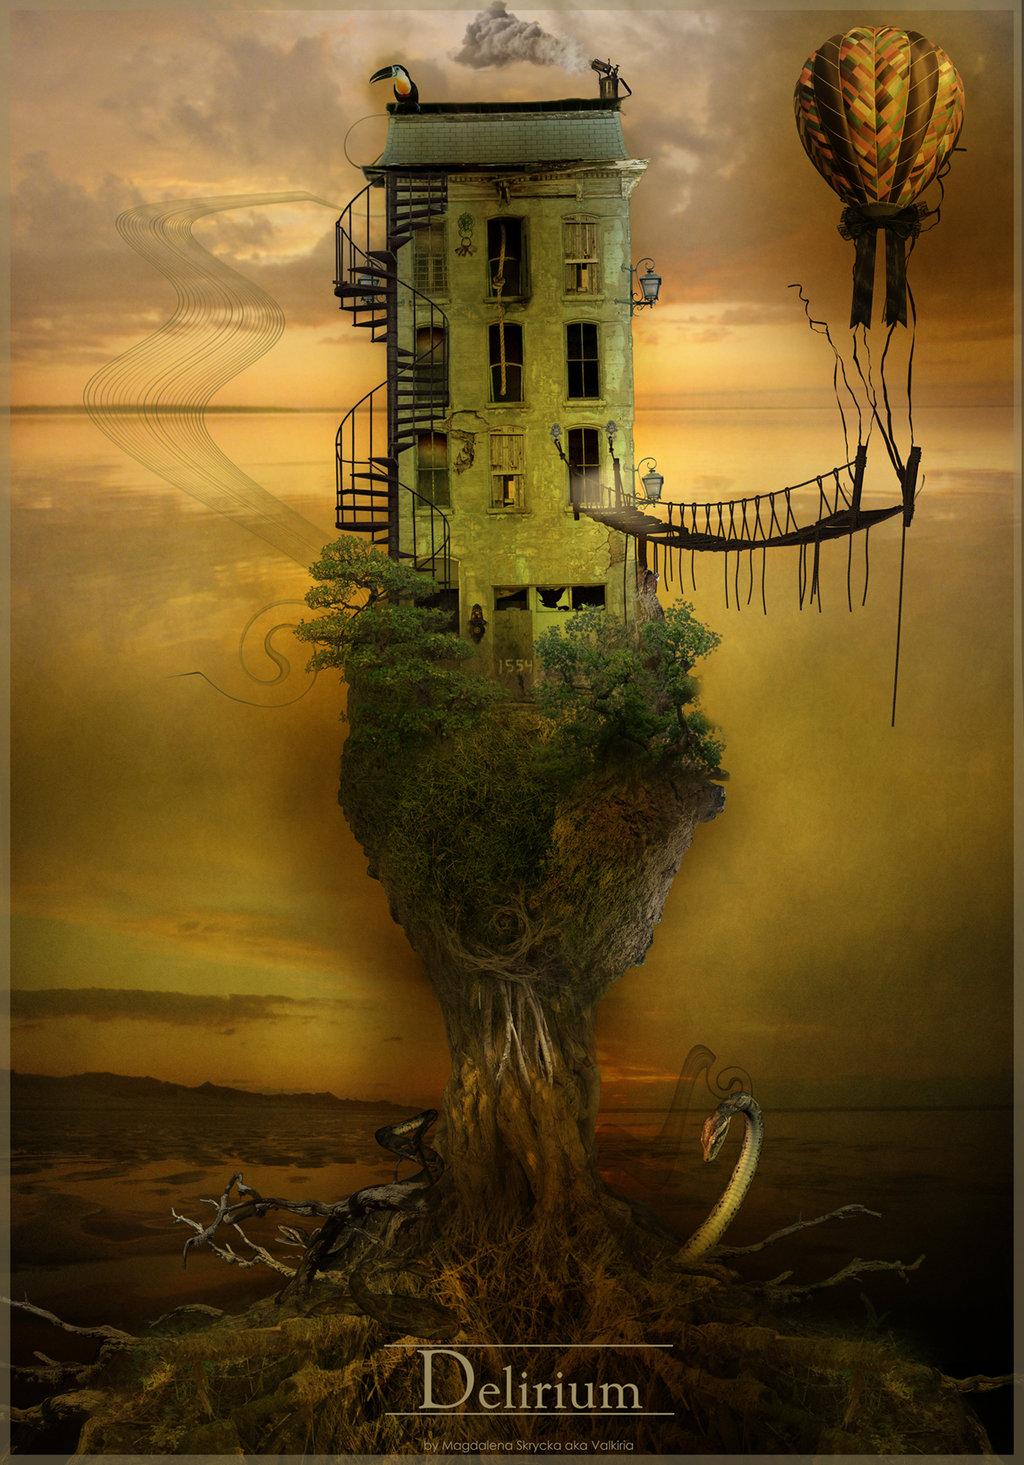 WA WAC DESIGN 2: Modern Surrealism with Photoshop